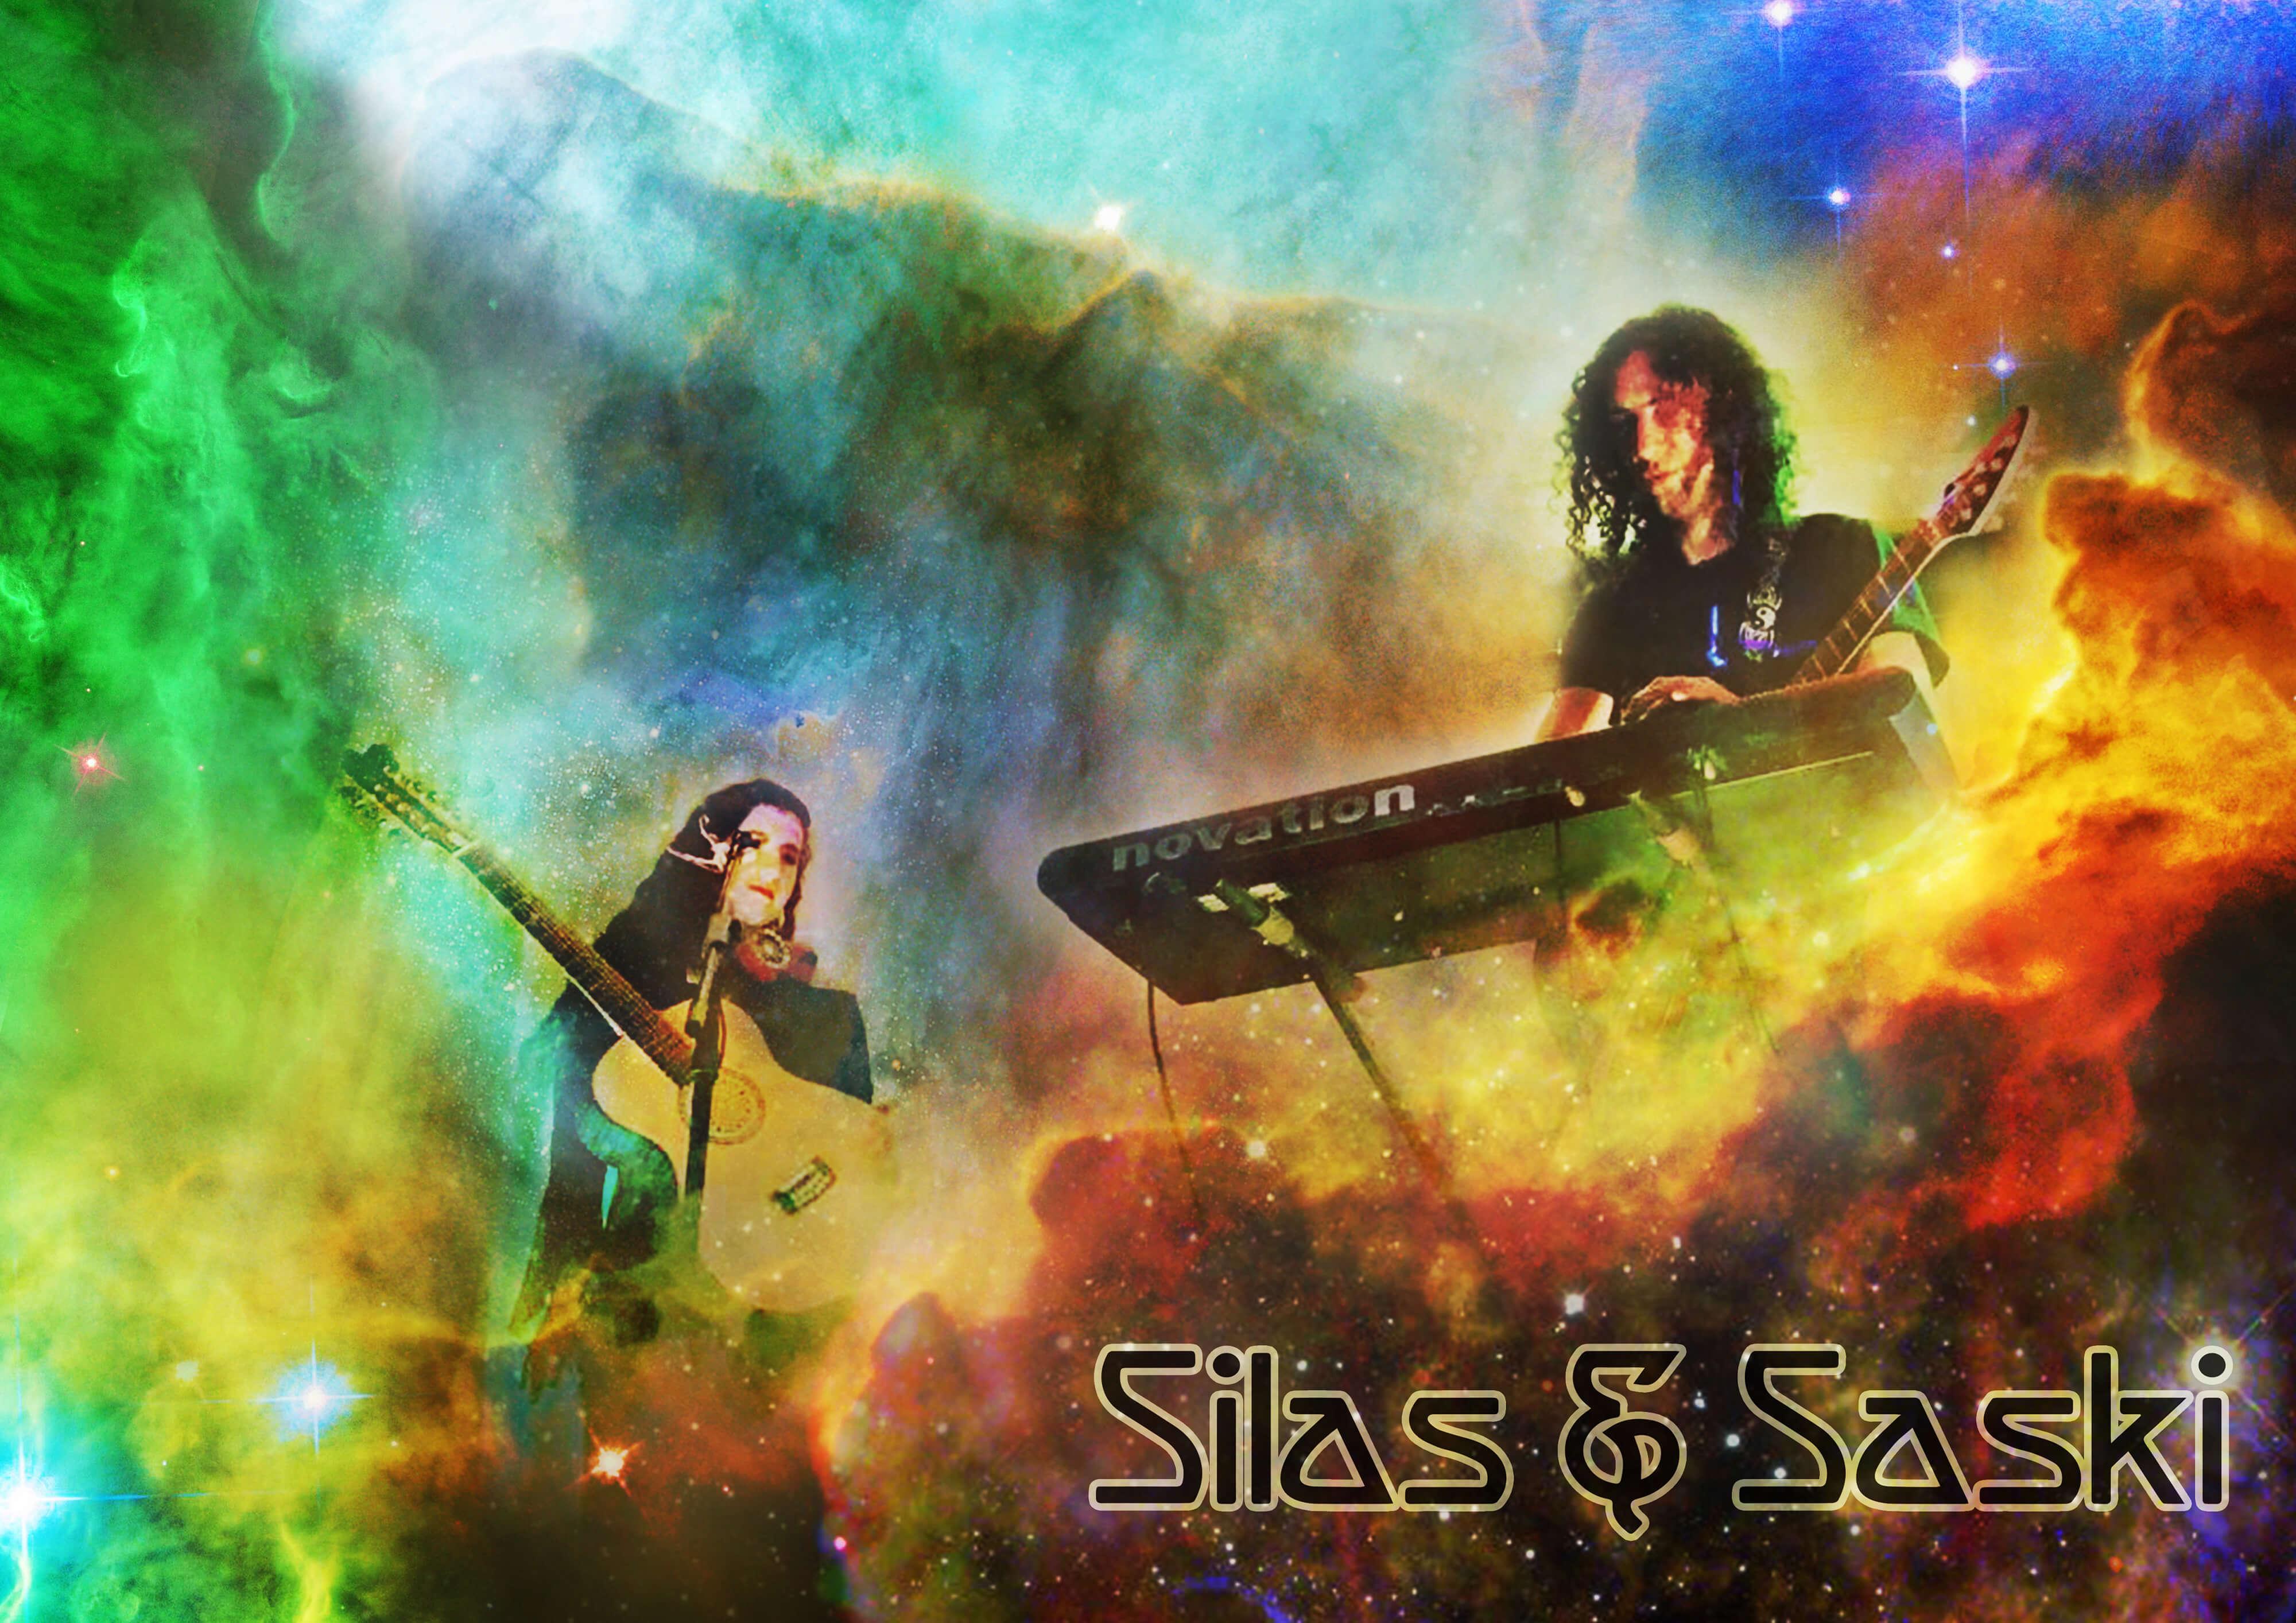 Silas & Saski/Silas Neptune